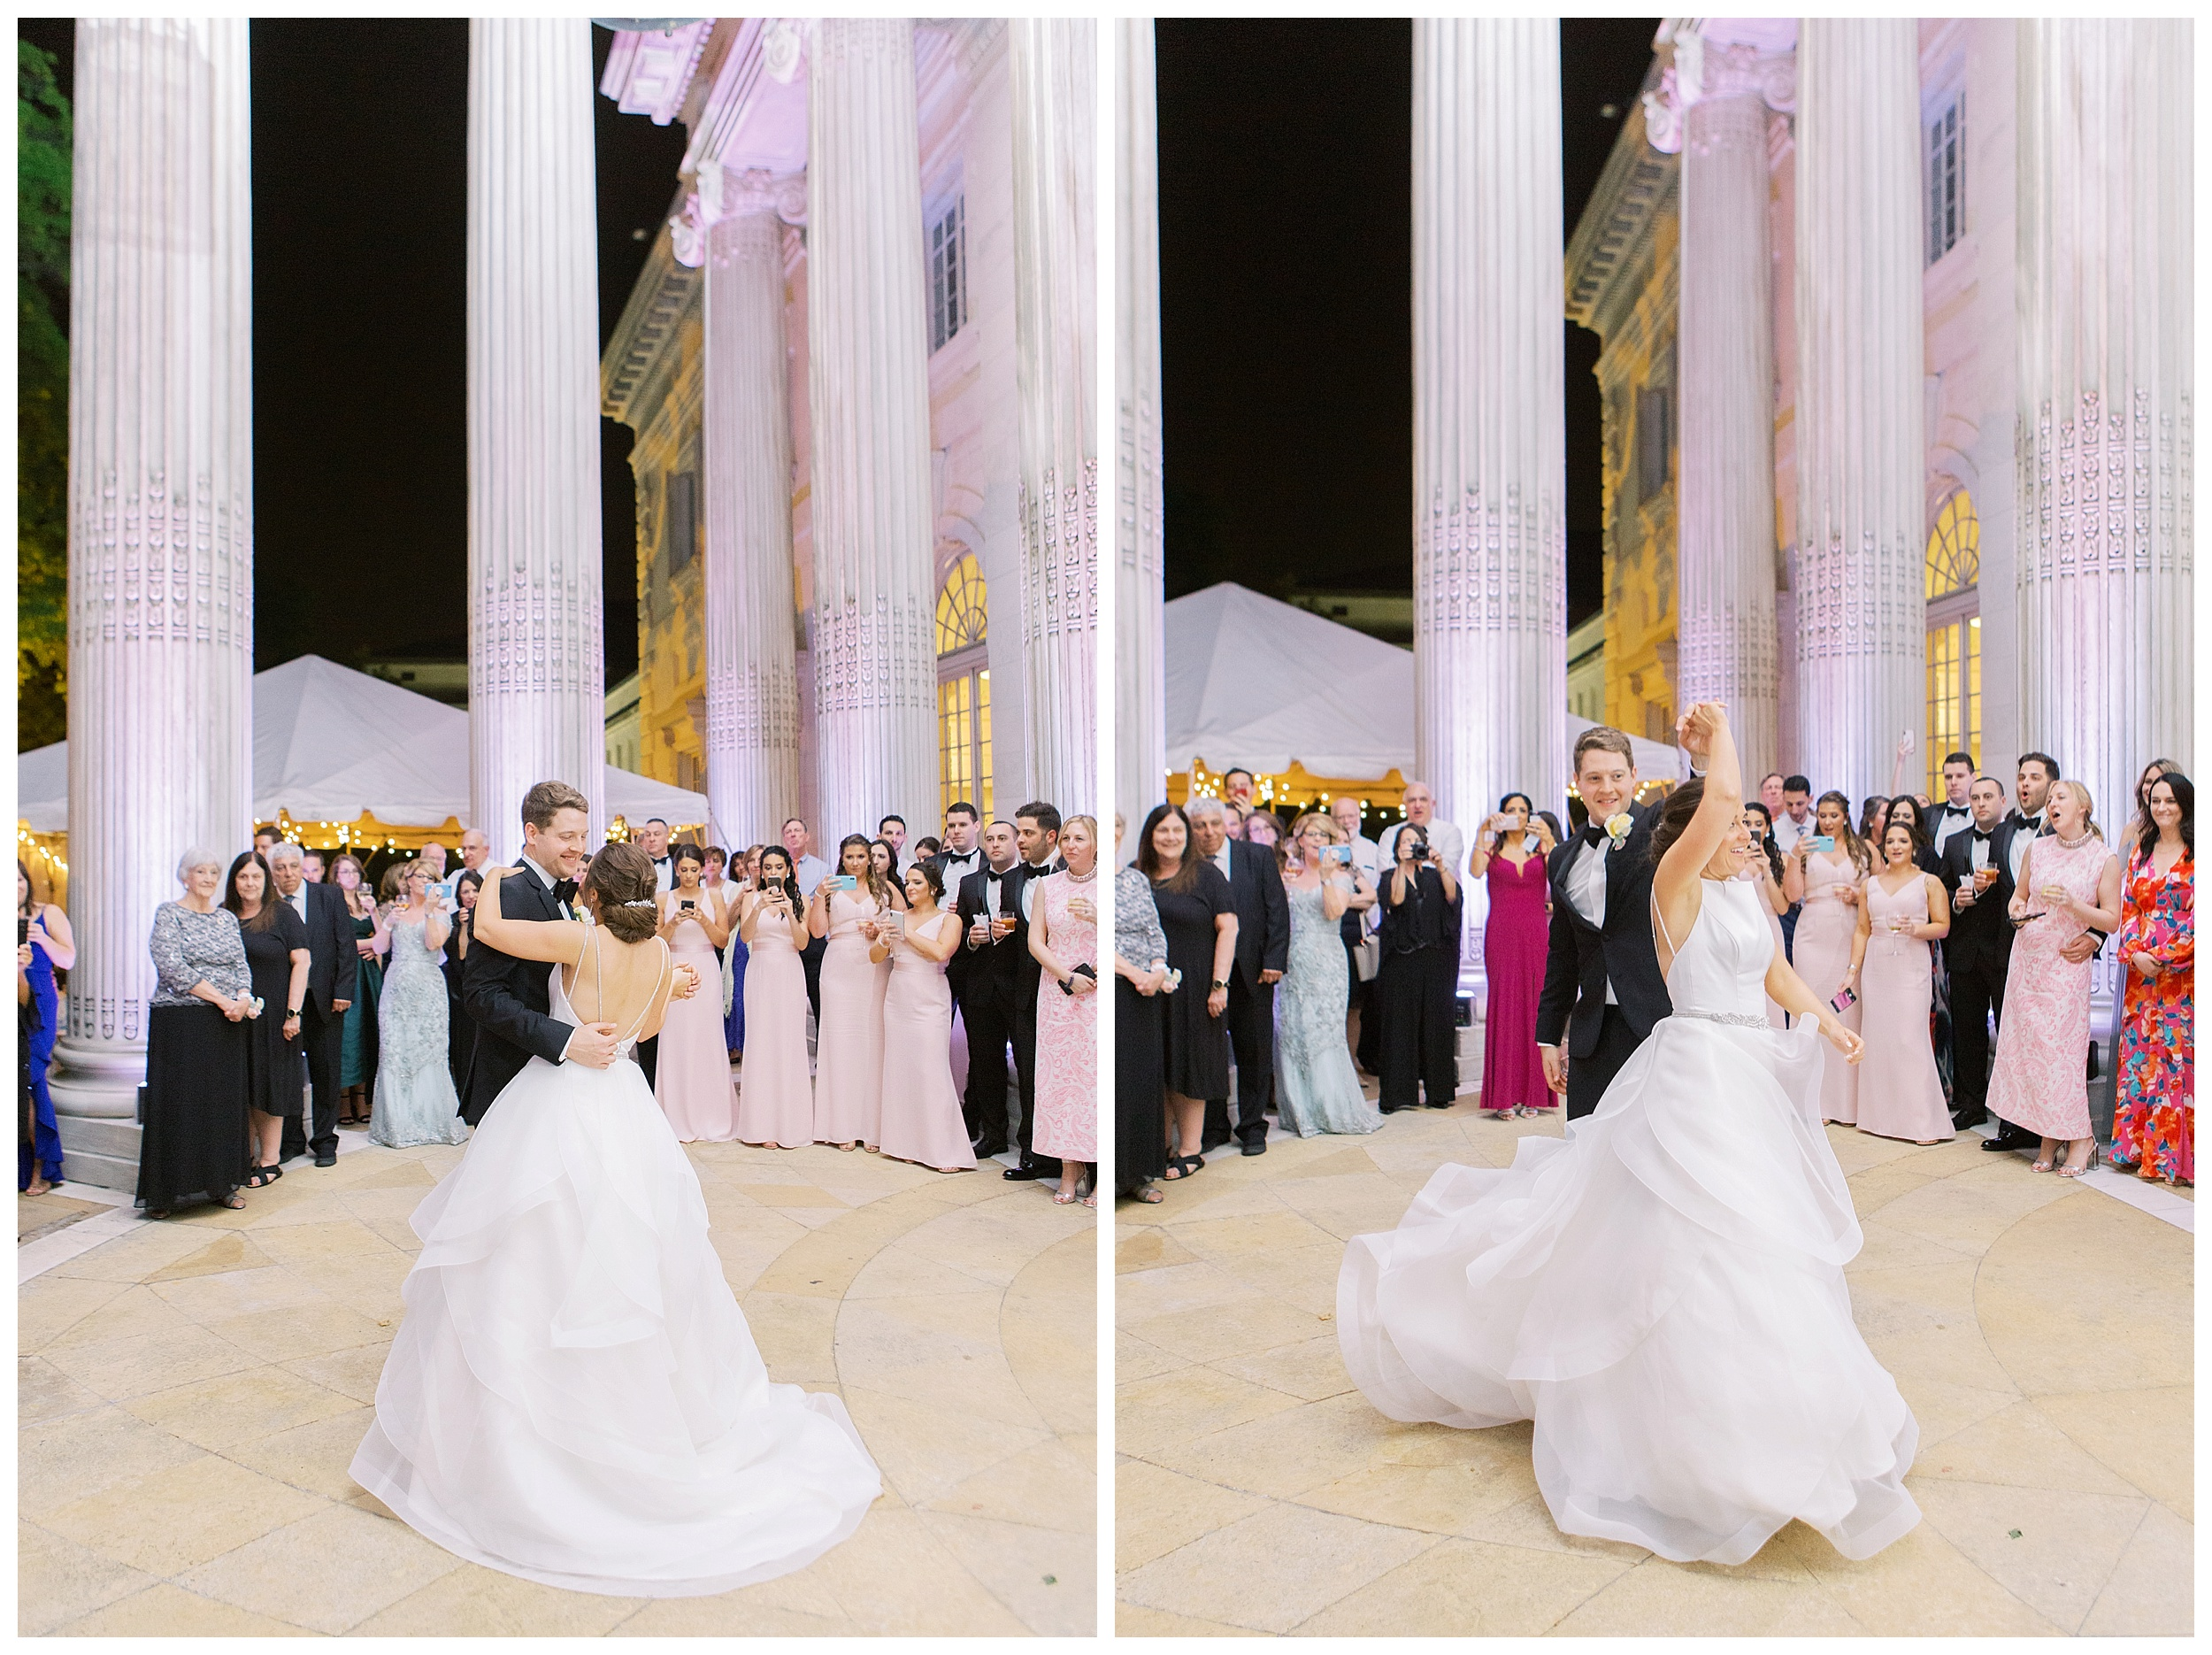 DAR Constitution Hall Wedding Wedding | Daughters of the American Revolution Wedding | District of Columbia Film Wedding Photographer Kir Tuben_0135.jpg